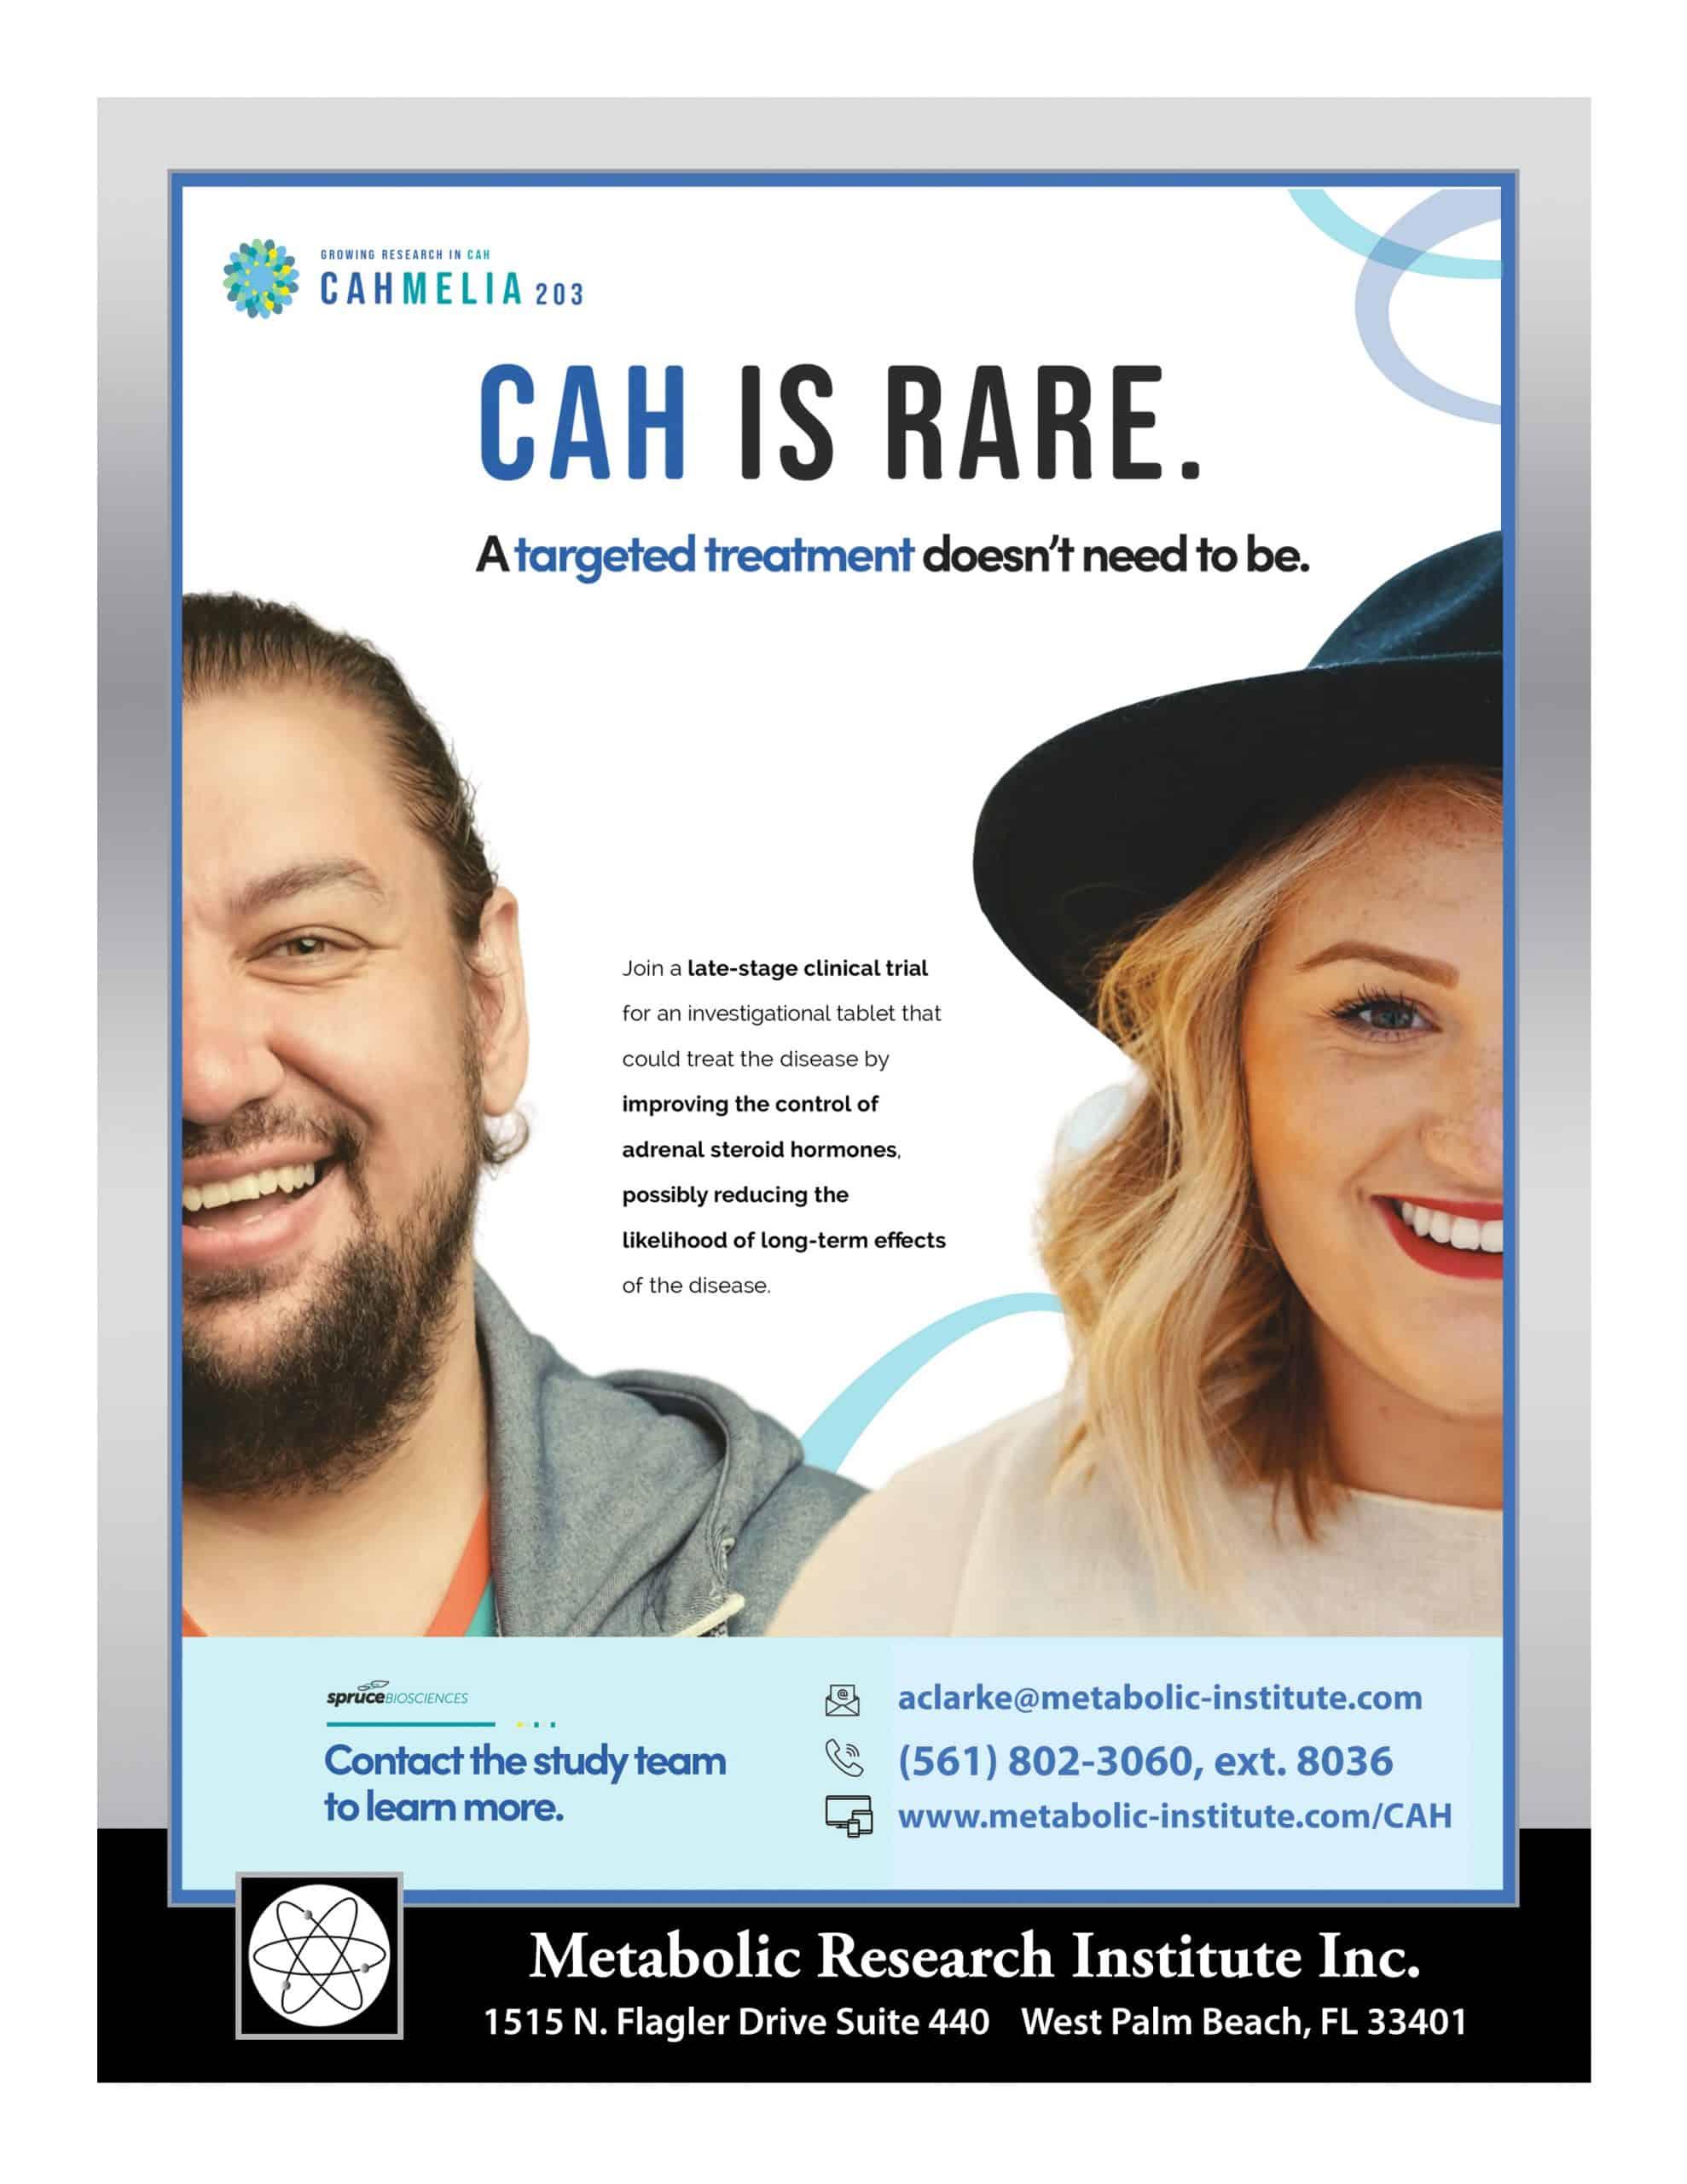 Congenital Adrenal Hyperplasia (CAH) study enrolling now in West Palm Beach FL